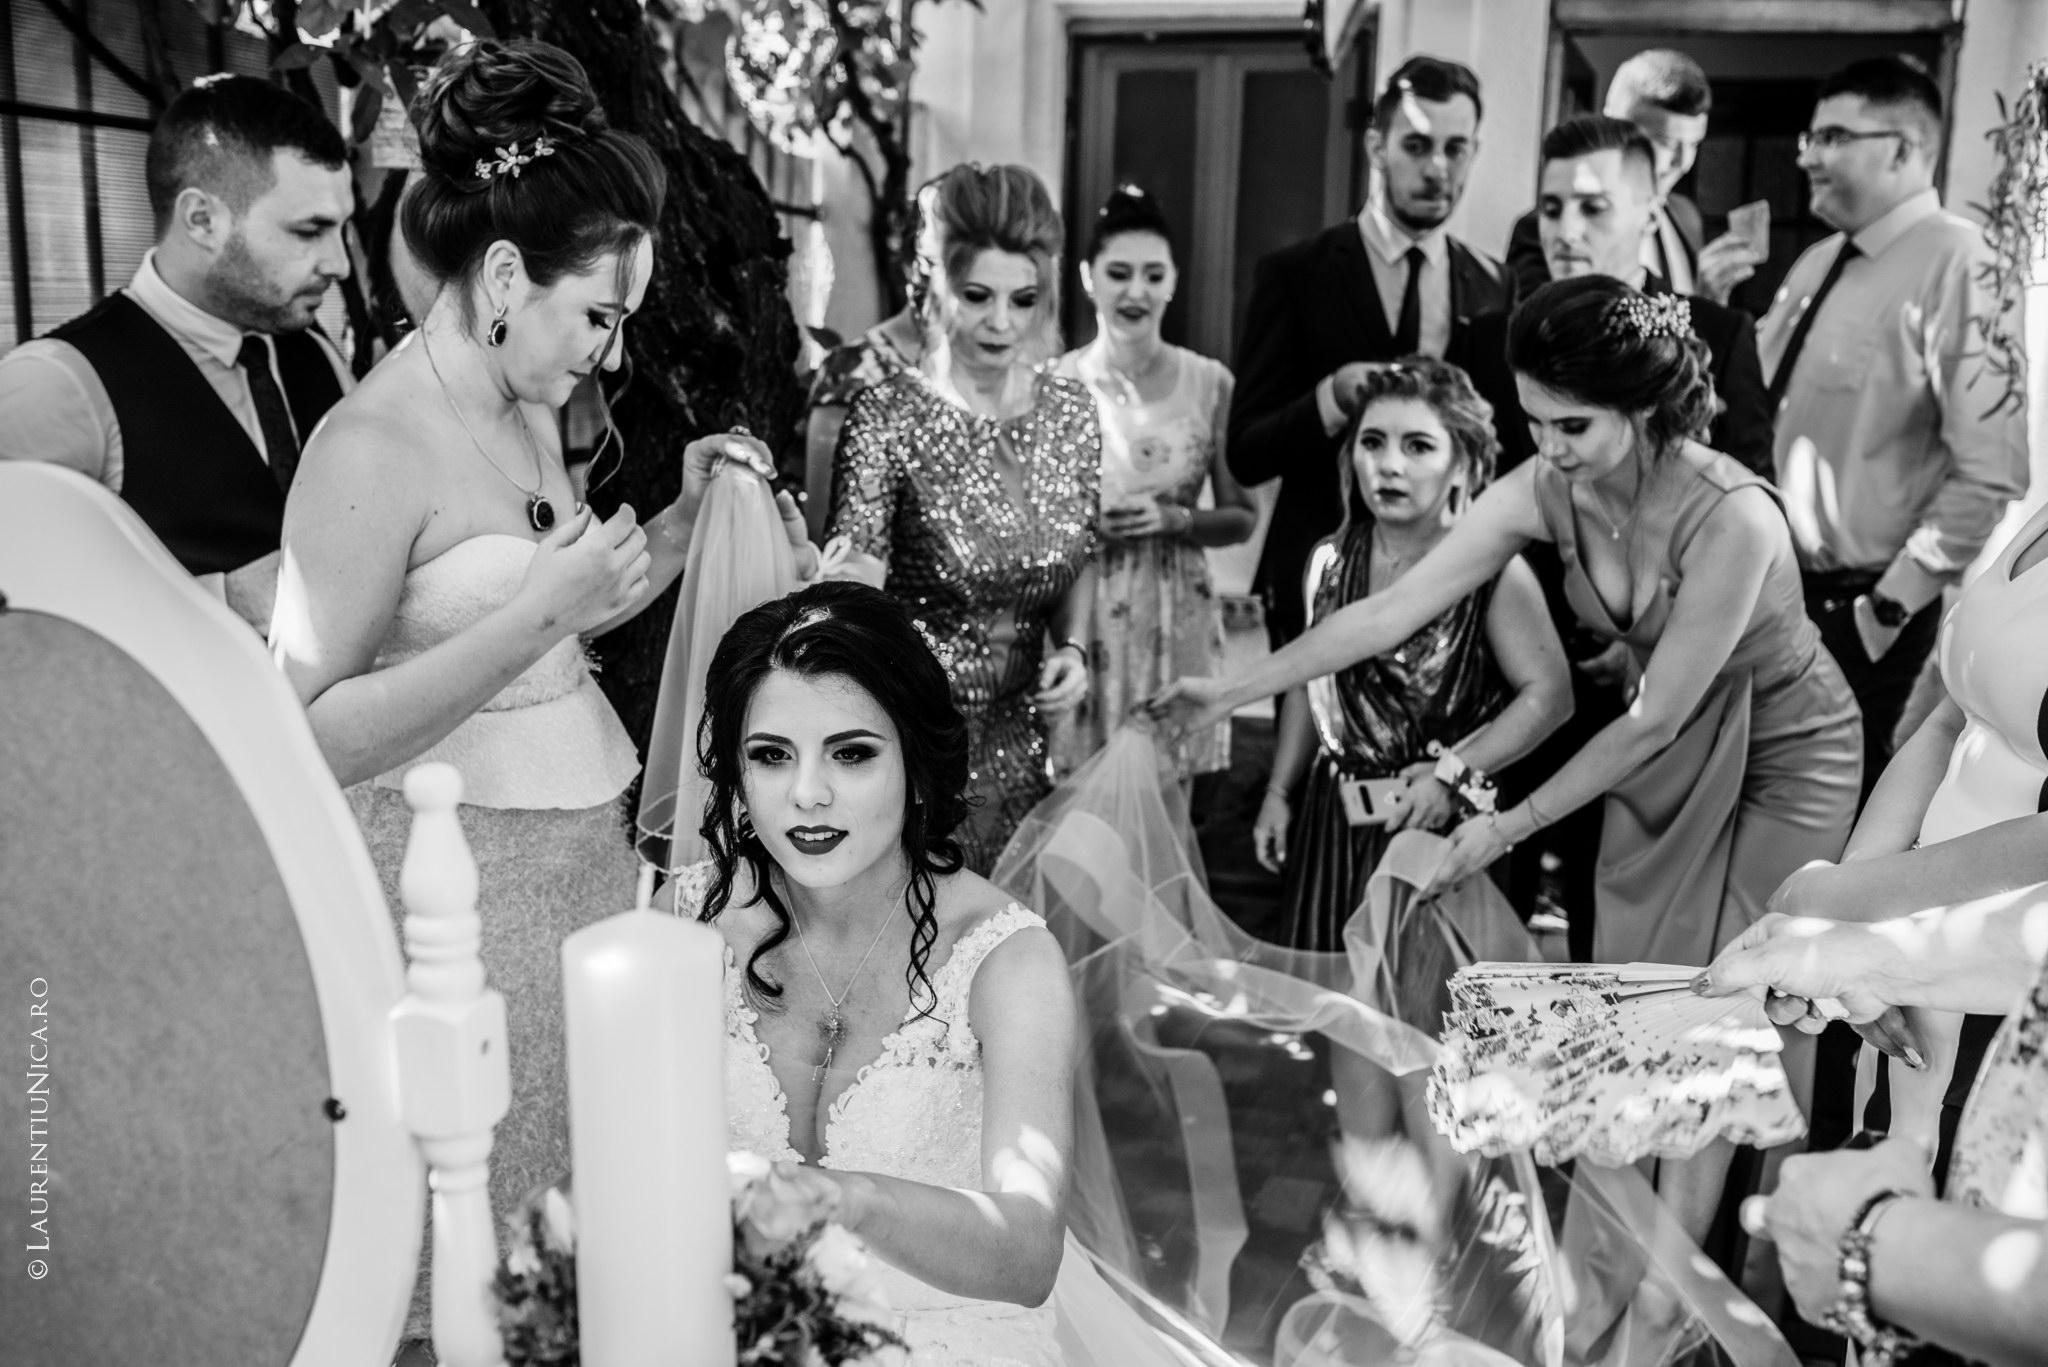 fotografii nunta craiova bia alex fotograf nunta laurentiu nica 21 - Bia & Alex | Fotografii nunta | Craiova